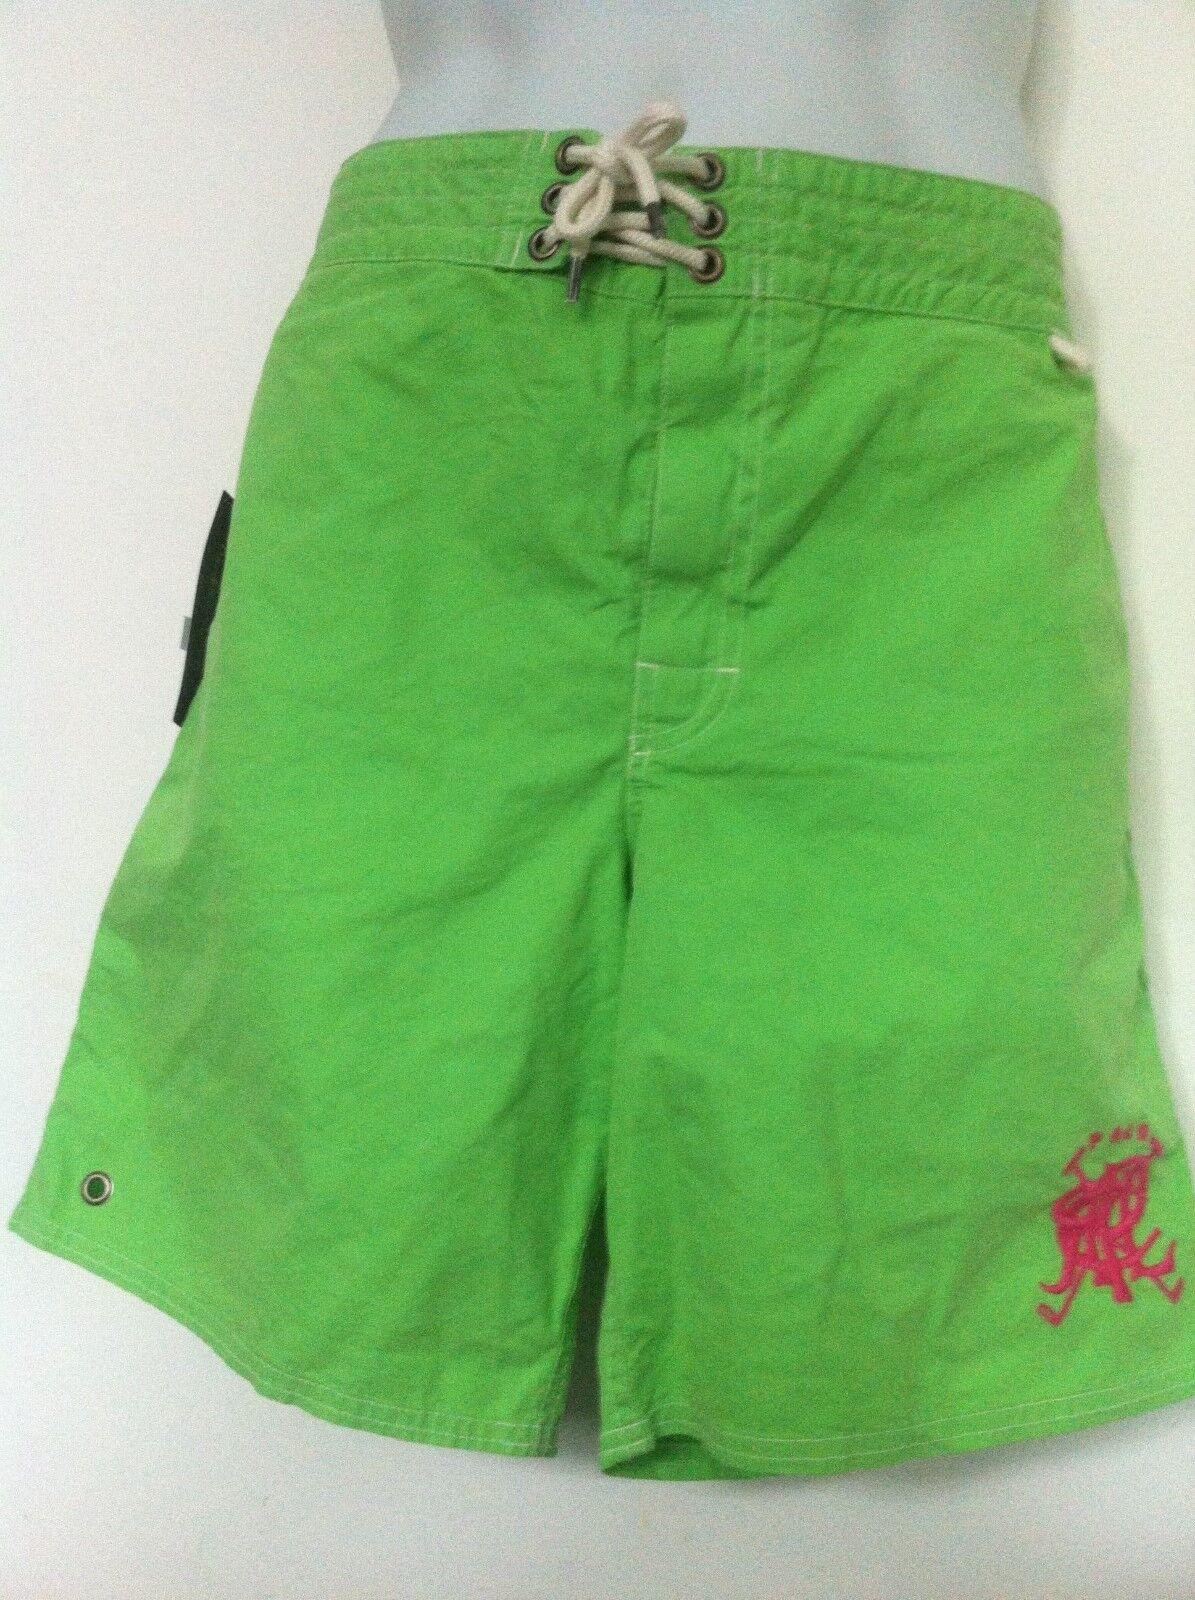 Ralph Lauren Polo Swimtrunks Solid Lime Green w Hot Pink Mallet Logo Size XL NWT